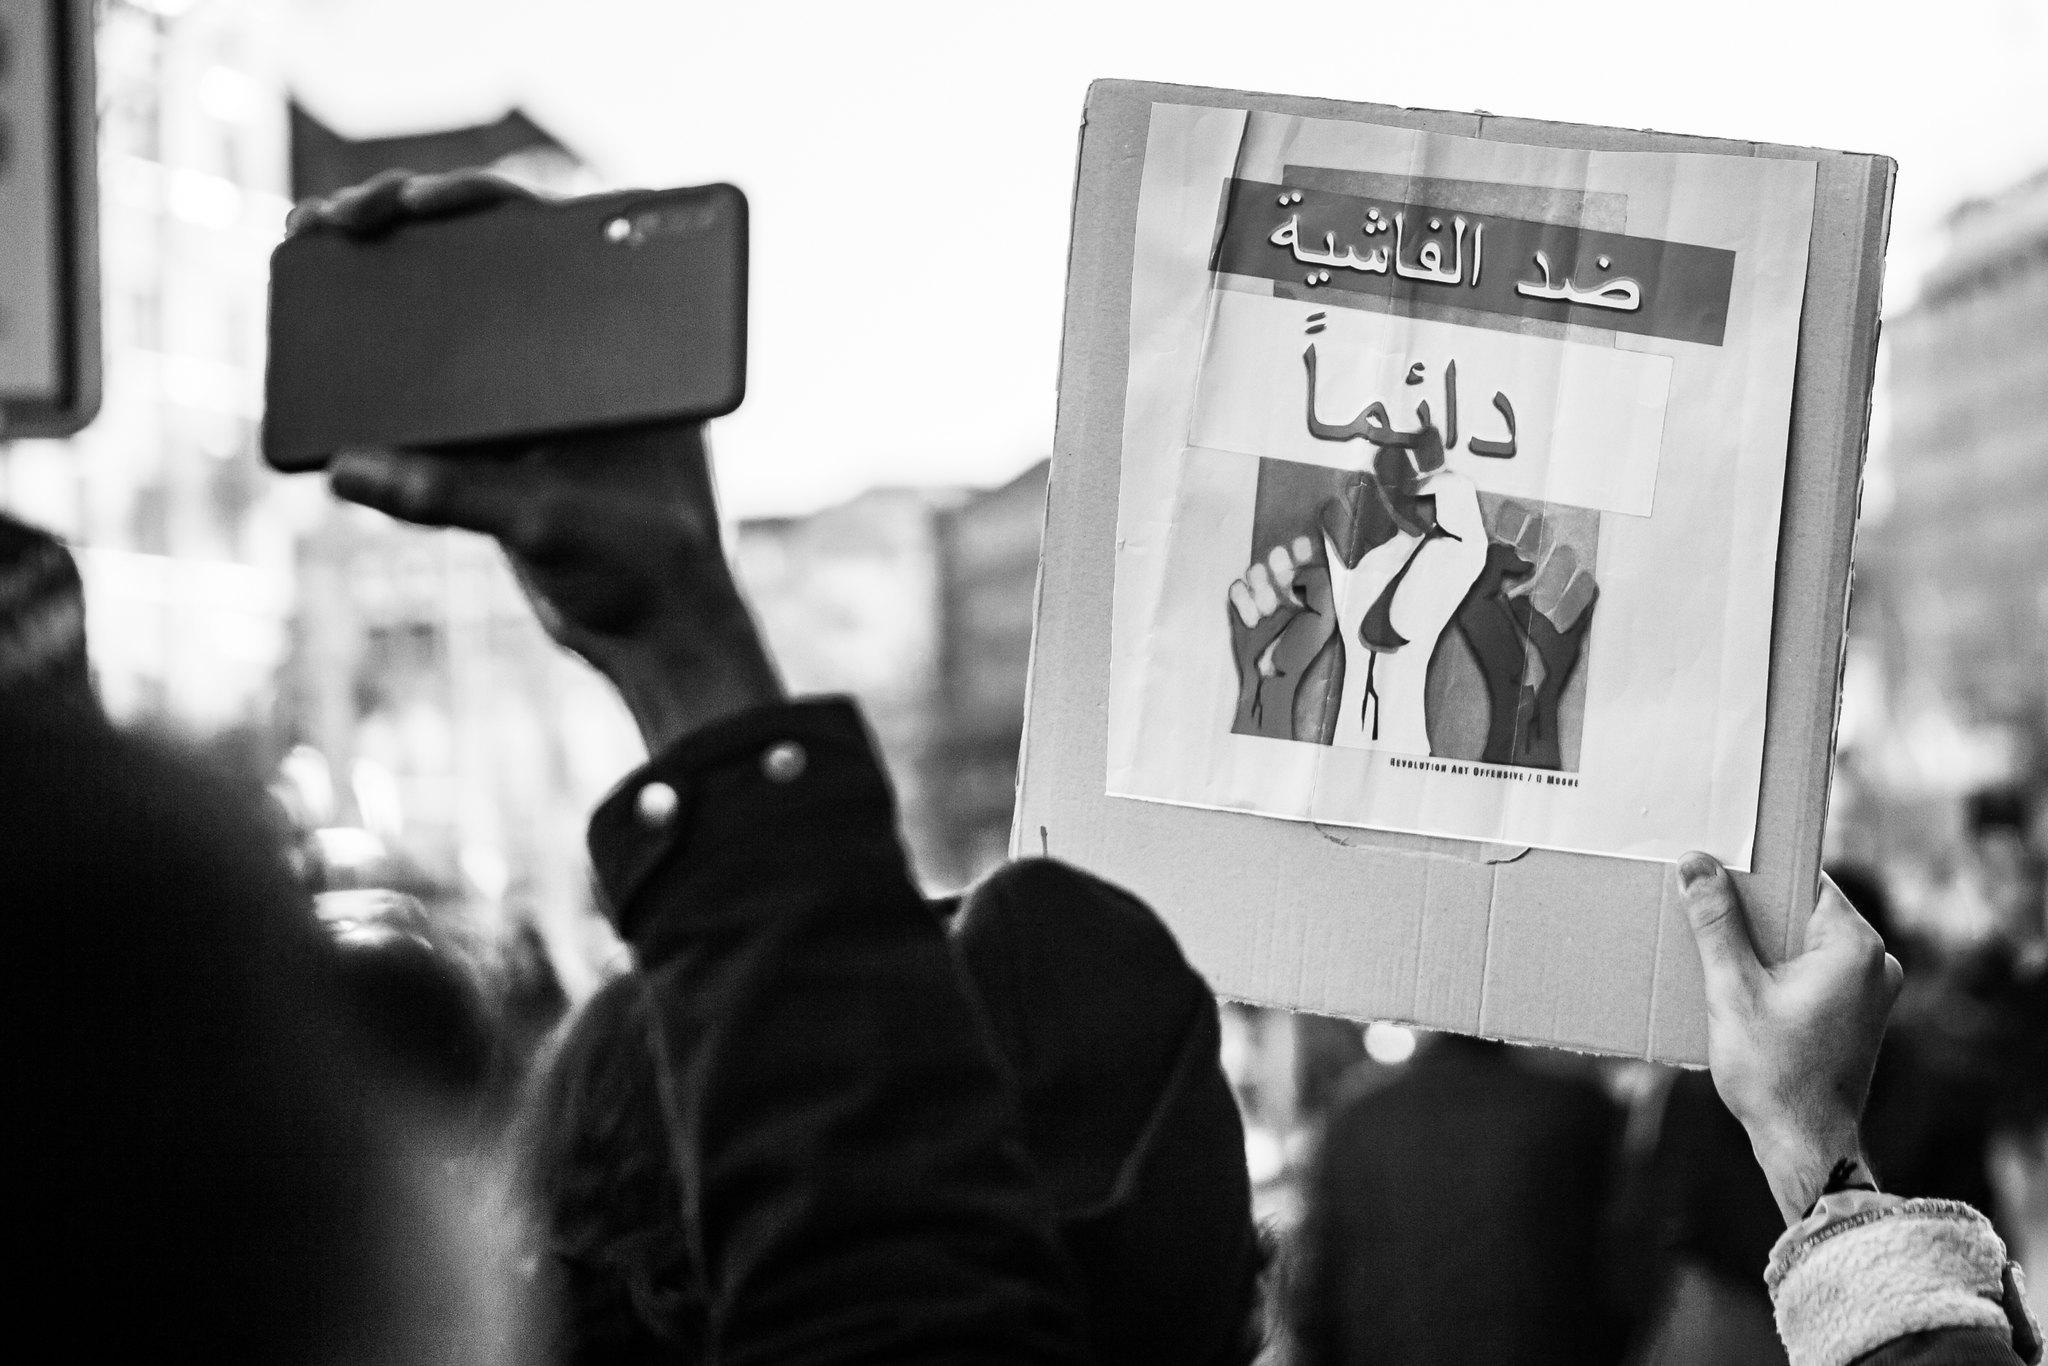 hossam el hamalawy flickr